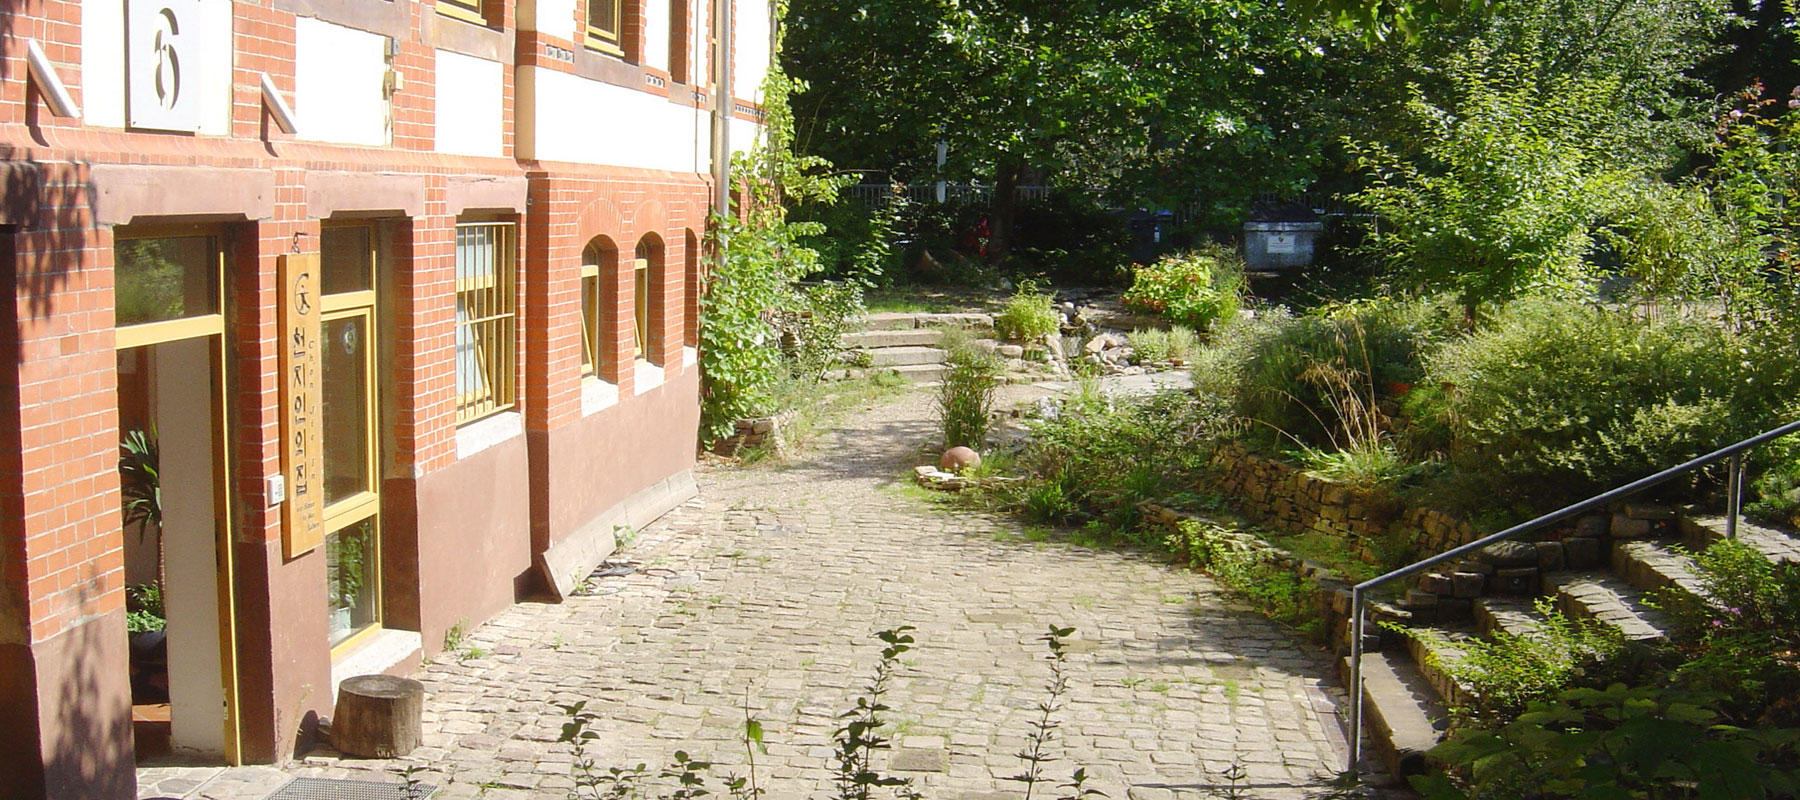 Shinson Hapkido St. Pauli Garten